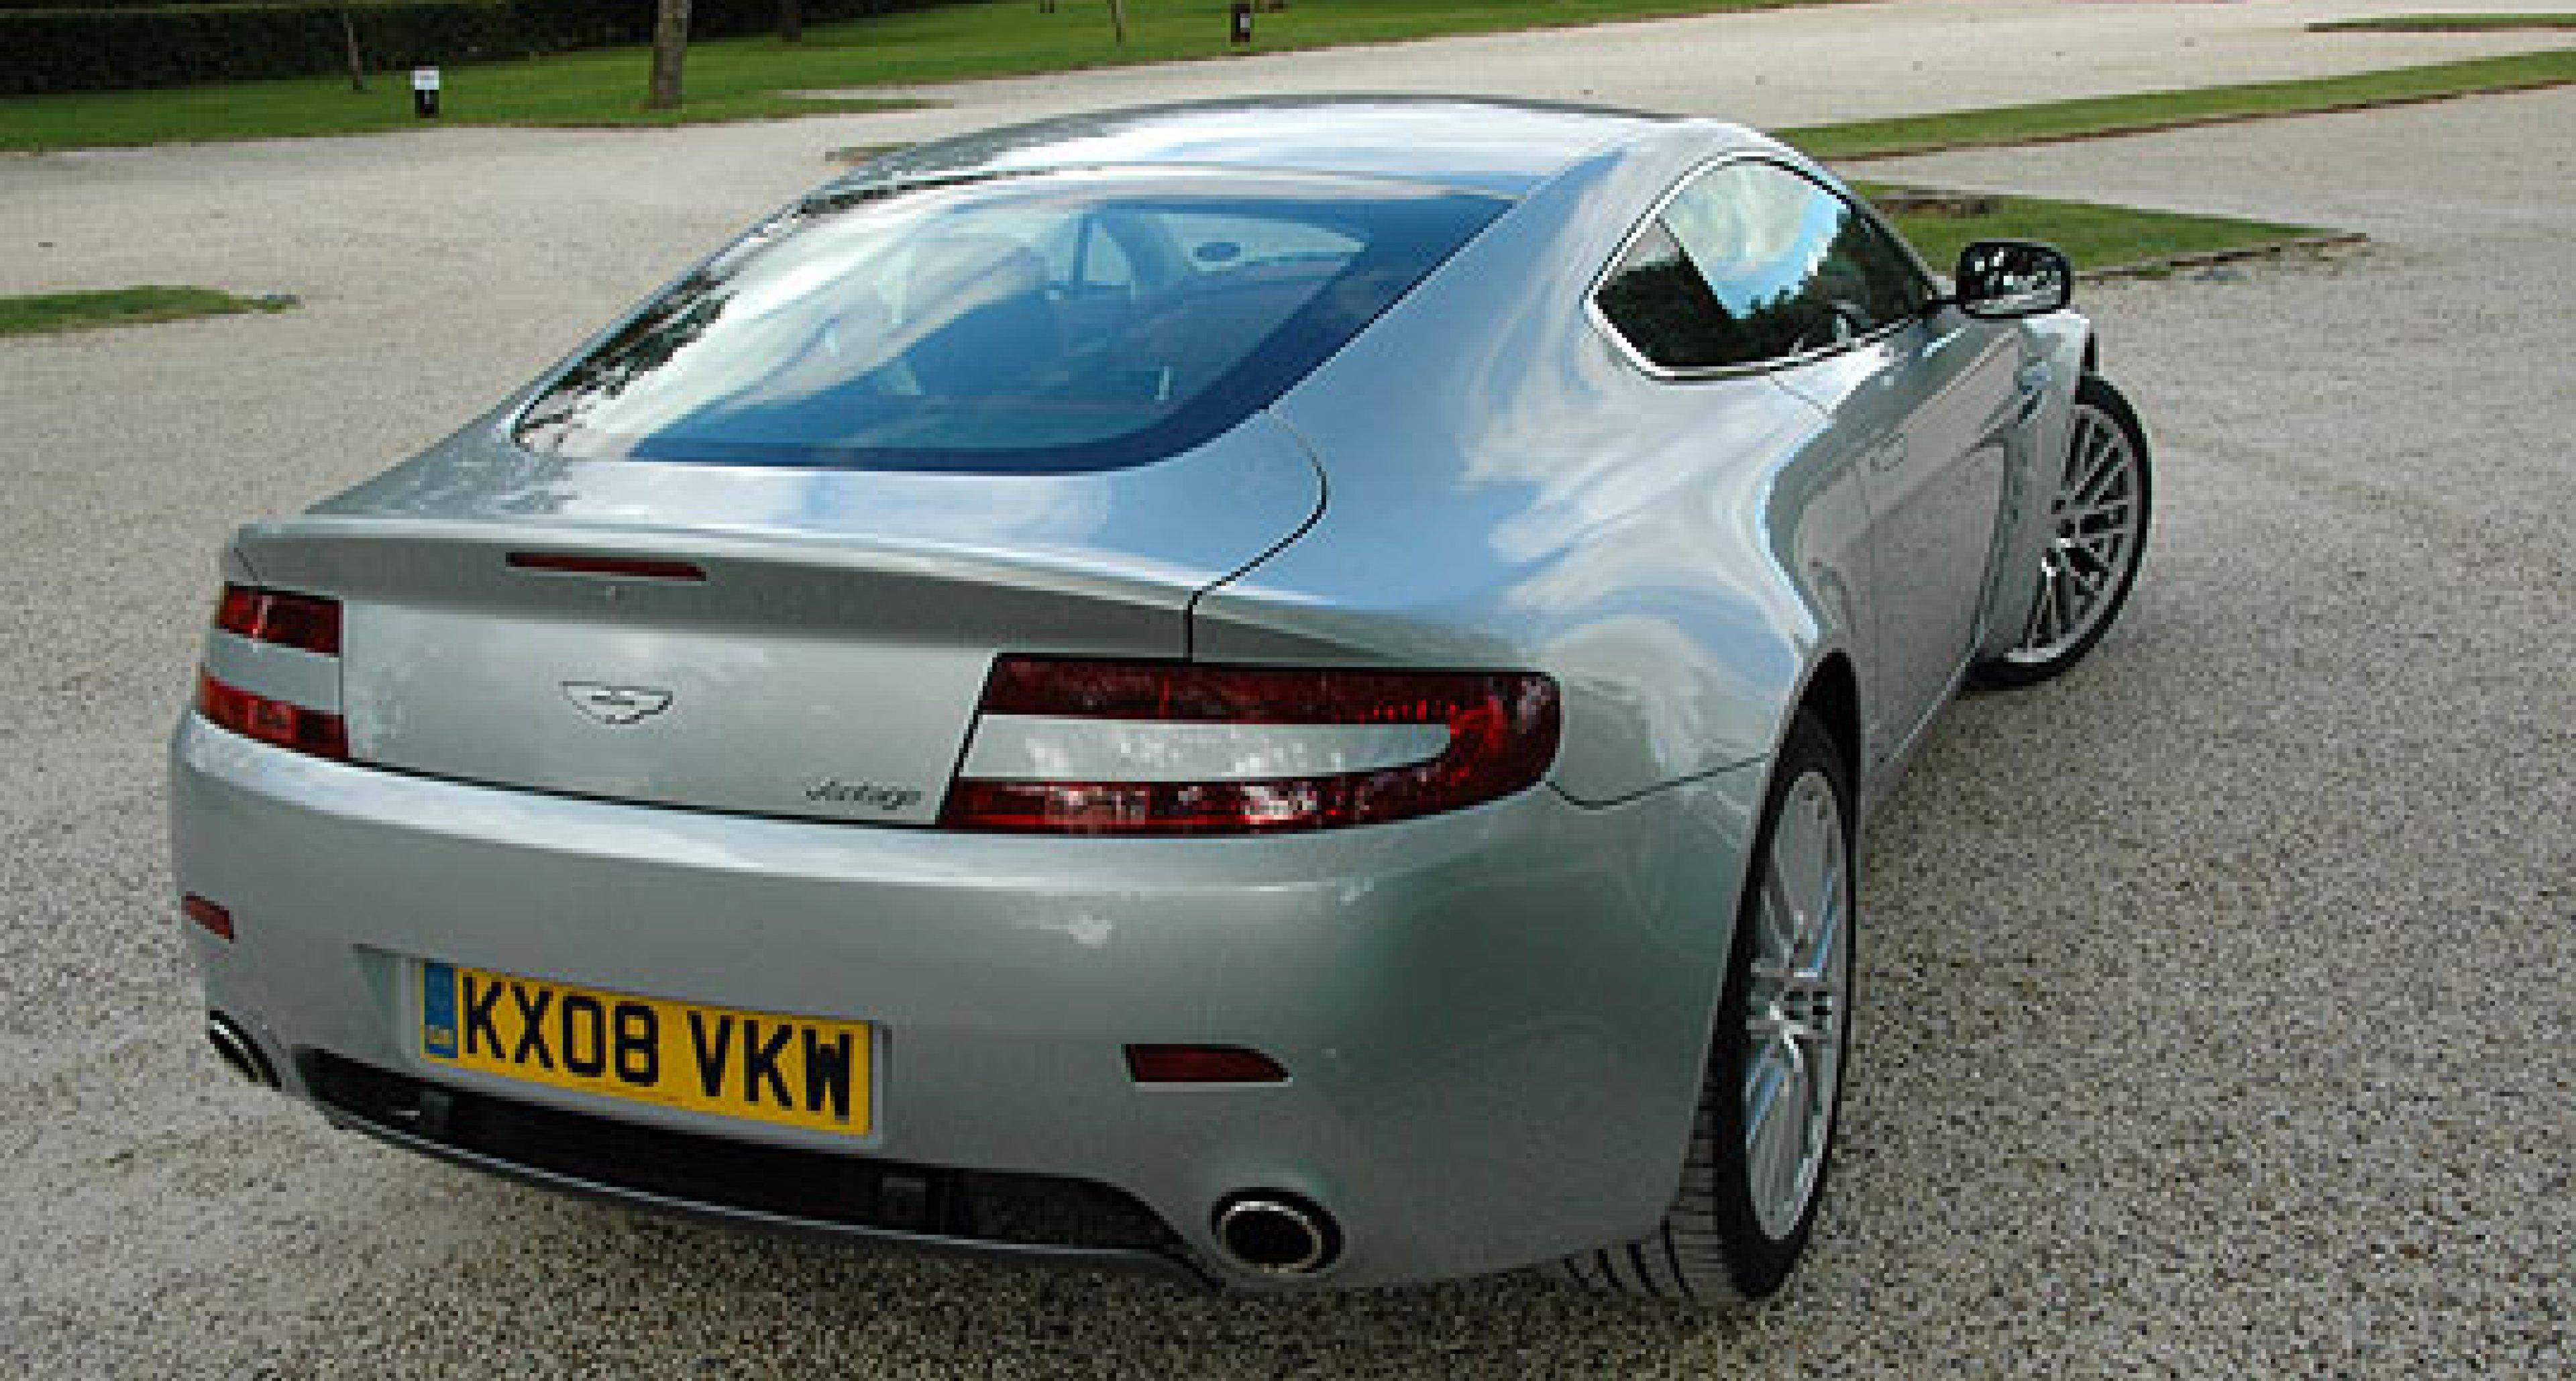 Road Test: Aston Martin V8 Vantage 4.7